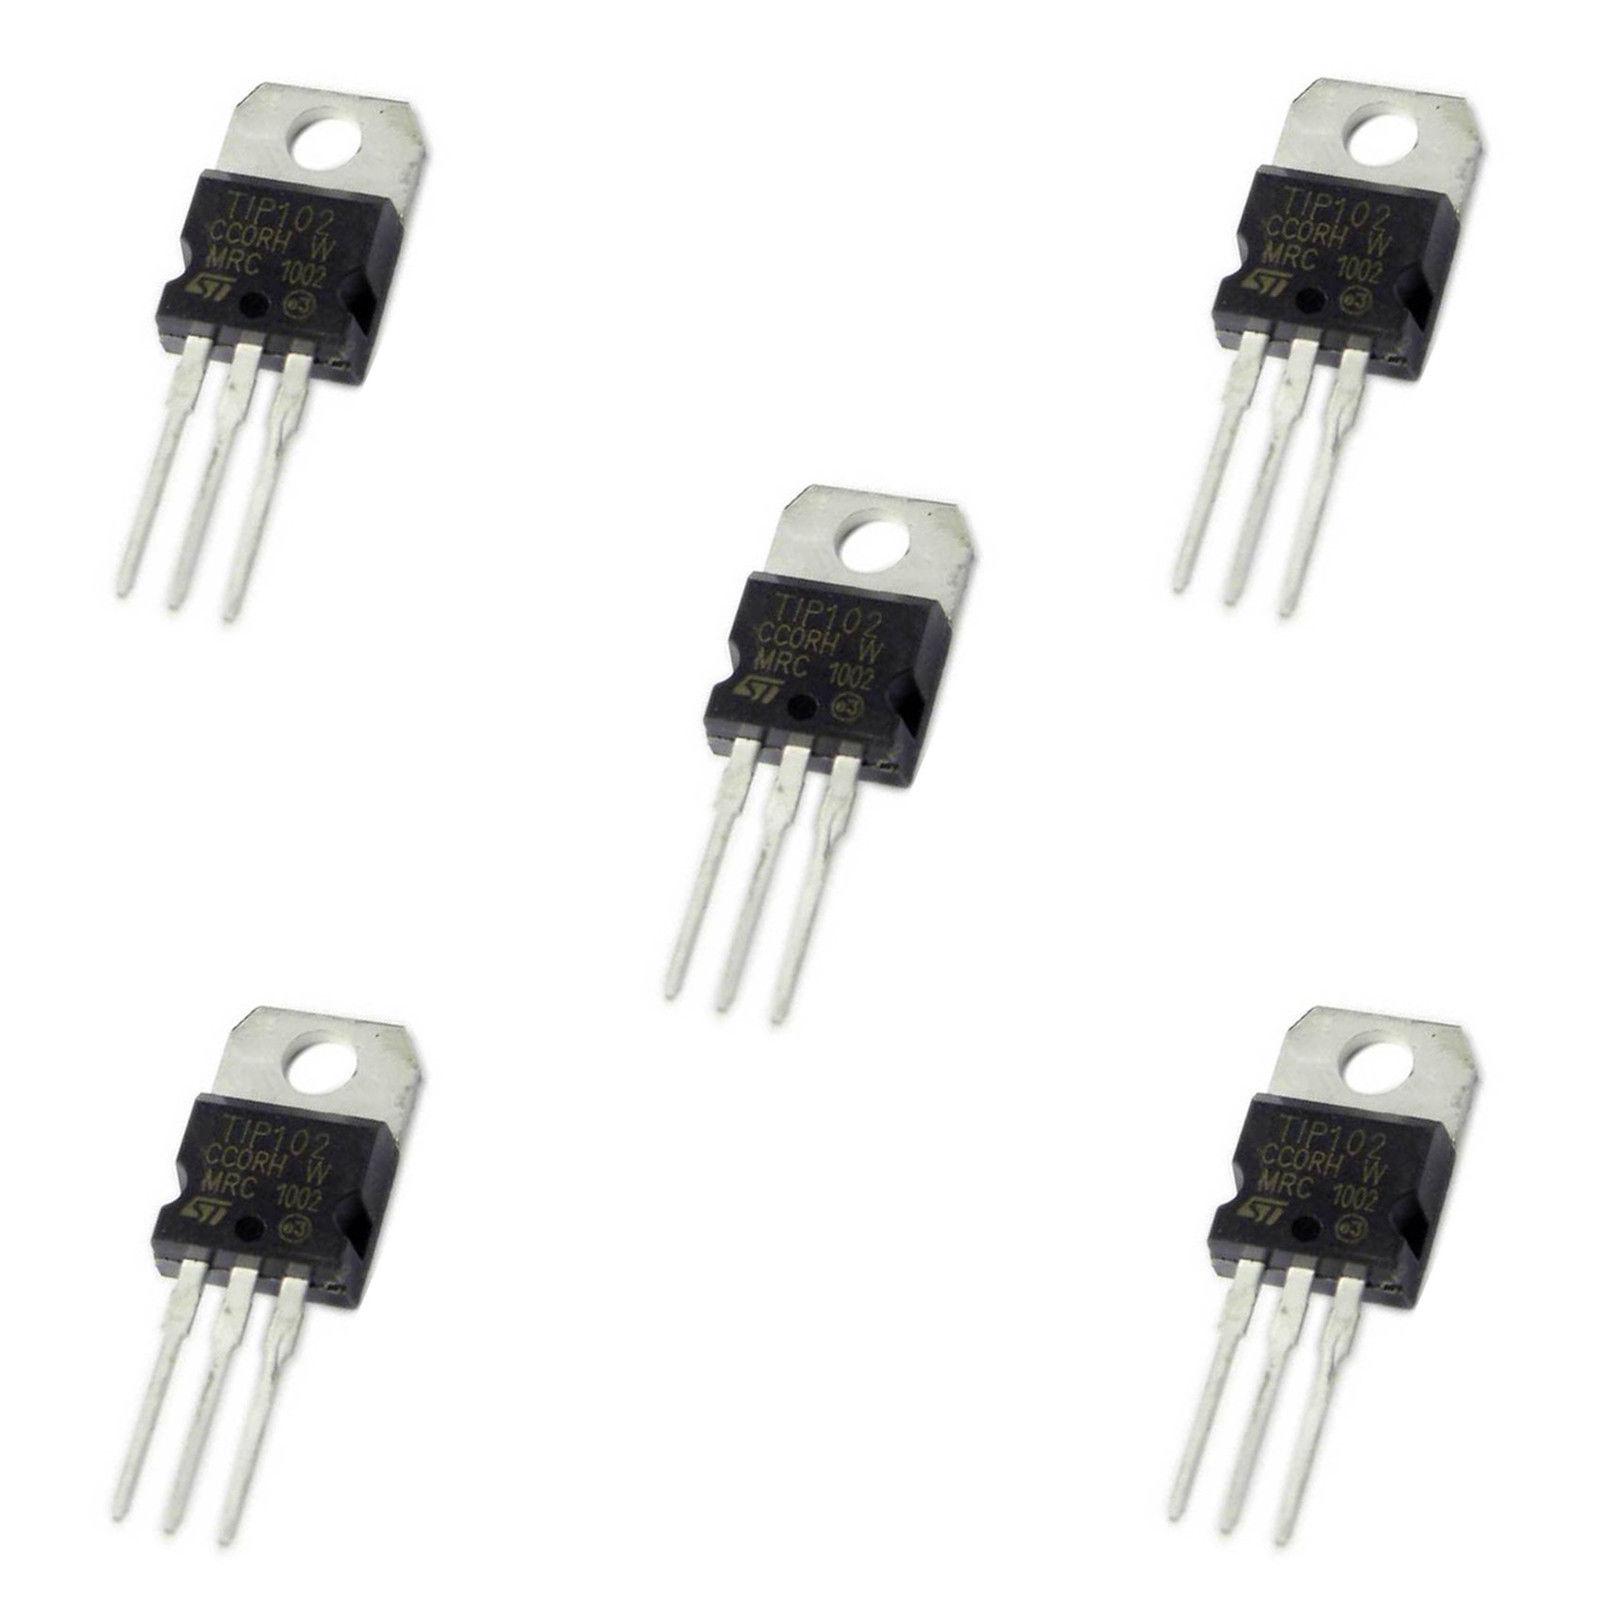 5 X Tip102 Npn Epitaxial Planar Silicon Darlington Transistor To 220 Configuration